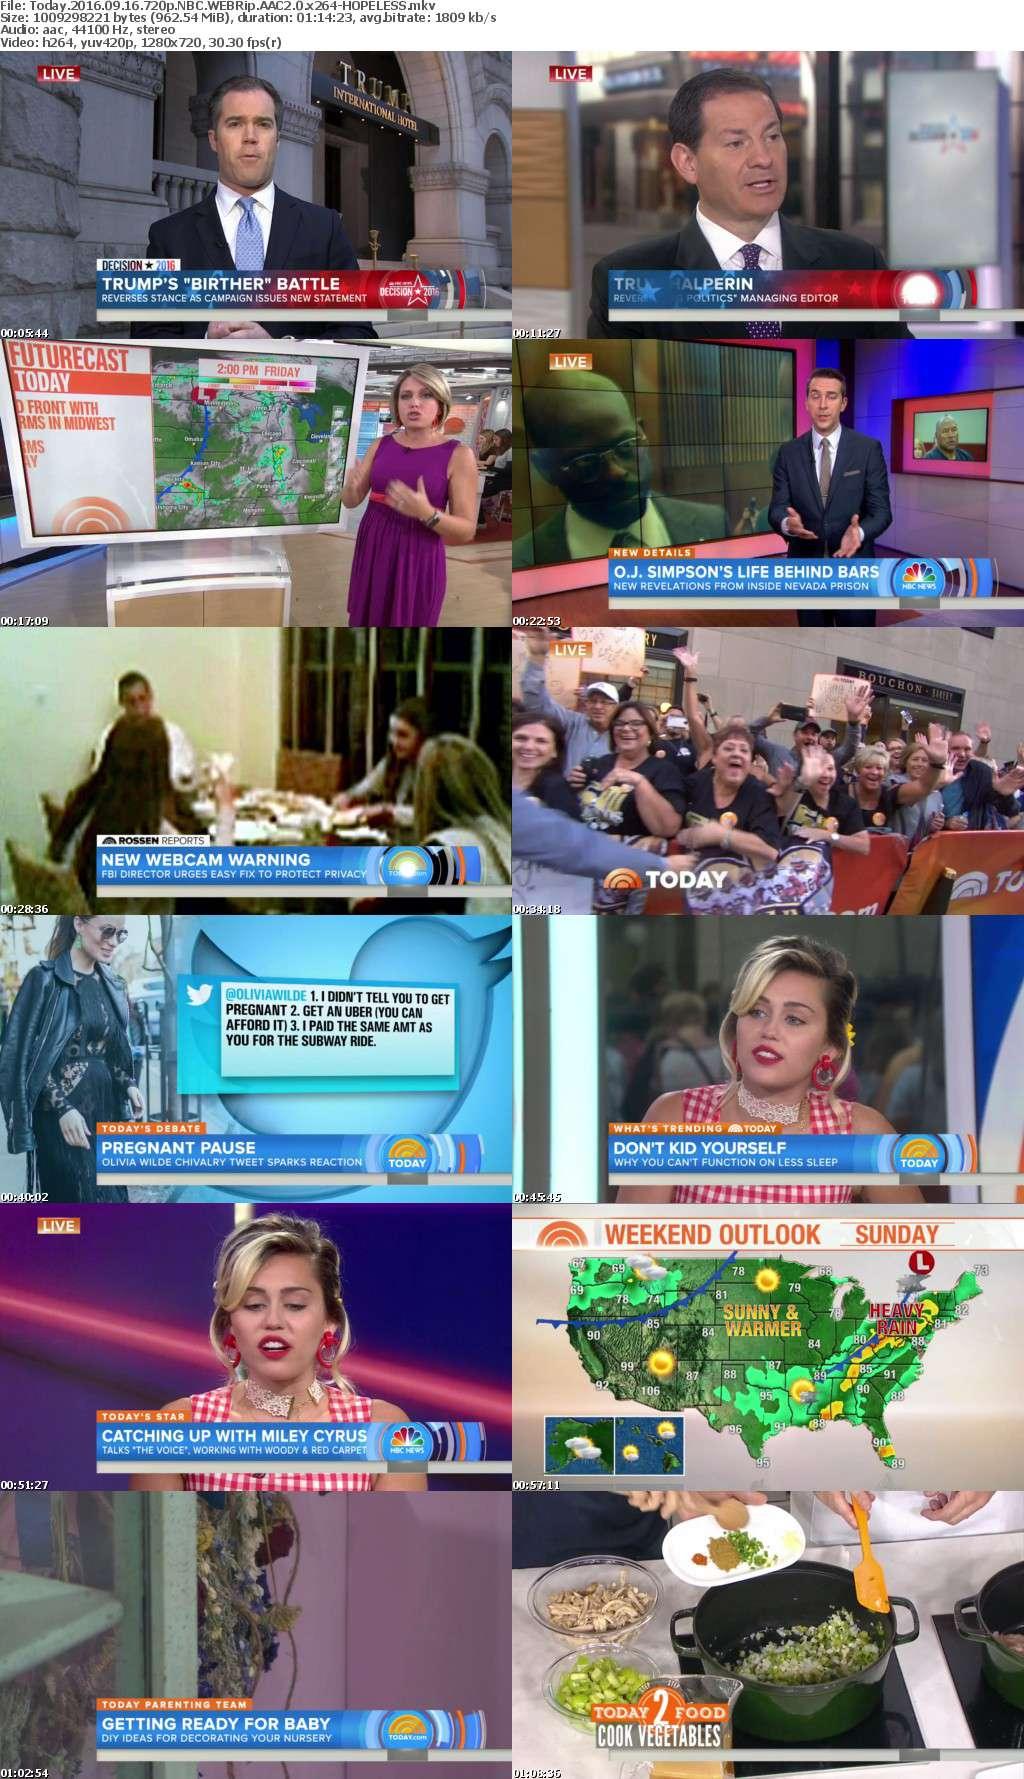 Today 2016 09 16 720p NBC WEBRip AAC2 0 x264-HOPELESS